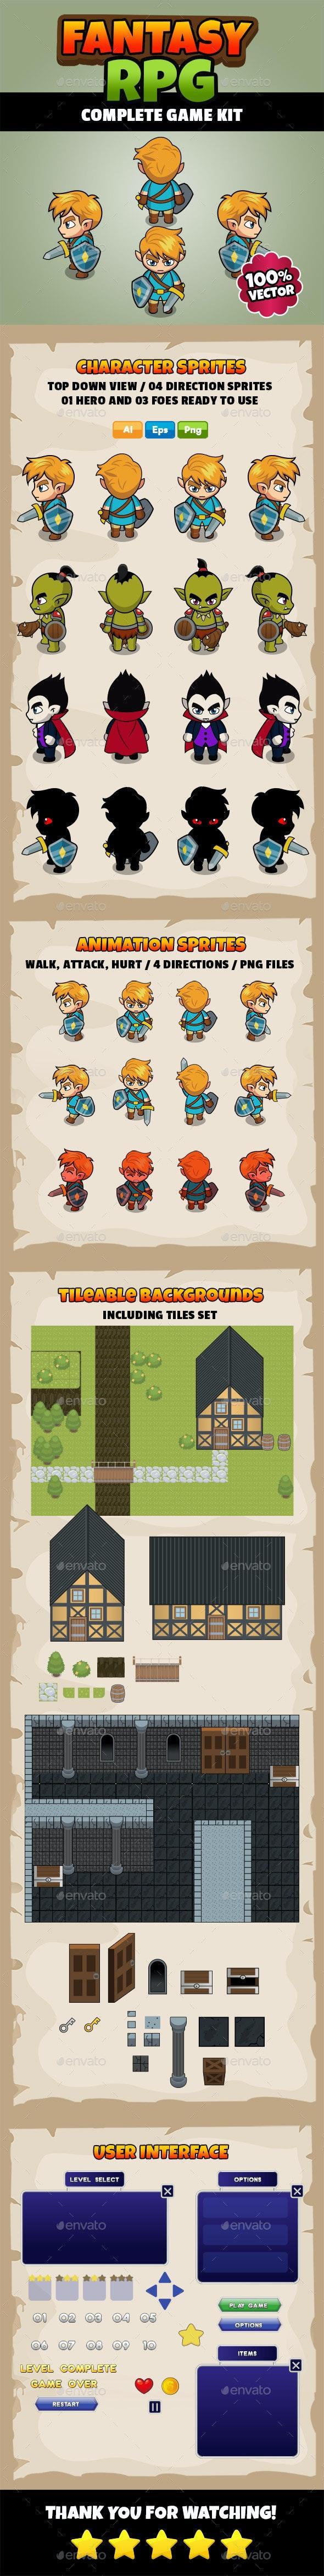 Fantasy RPG - Complete Game Kit - Game Kits Game Assets